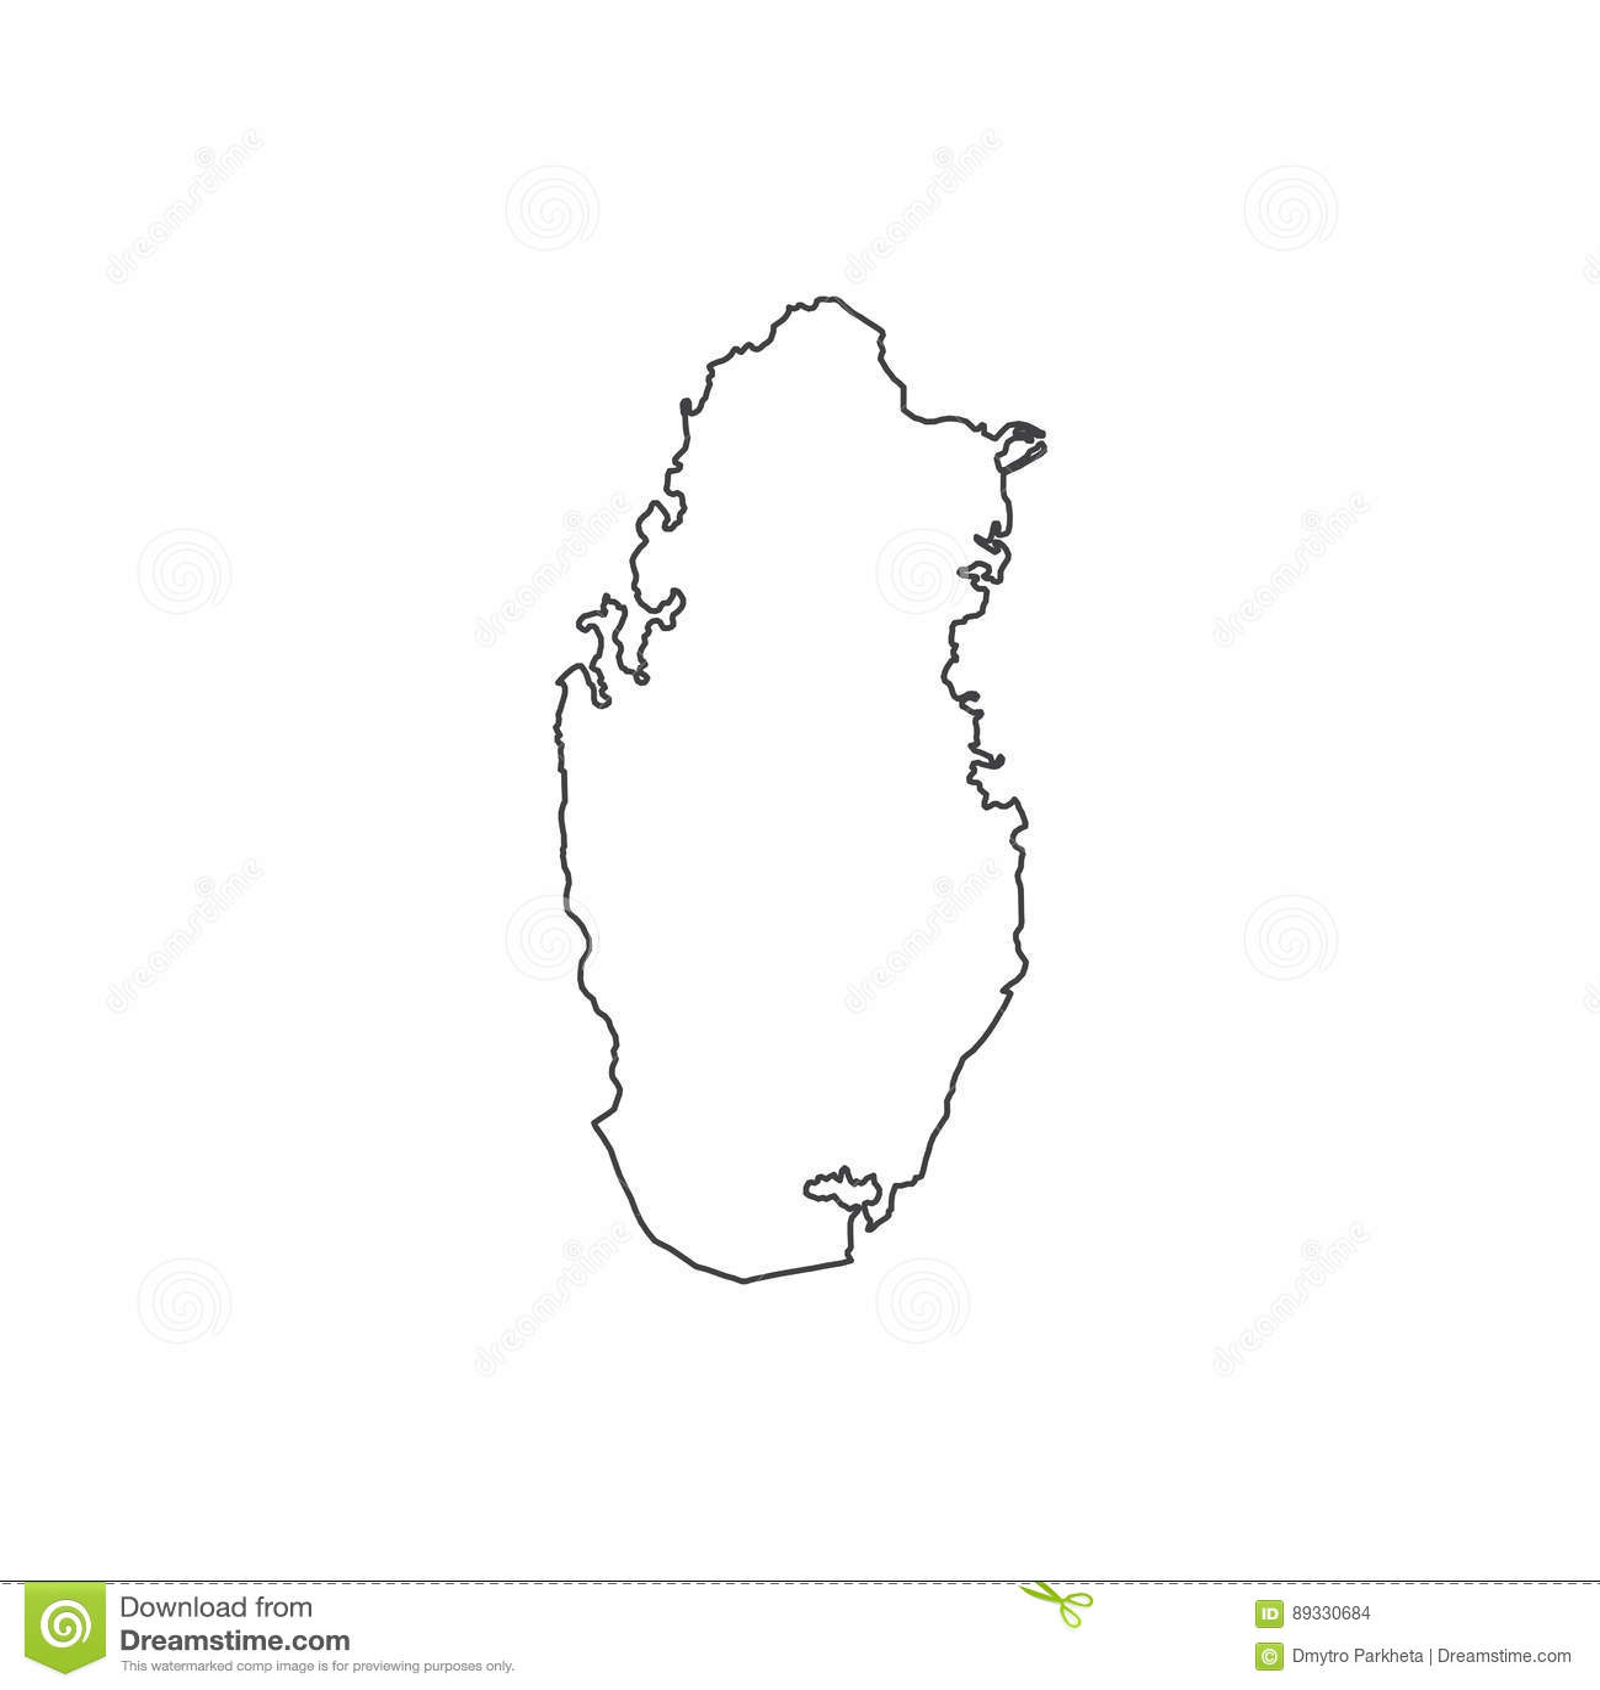 Qatar icon map silhouette stock vector. Illustration of ...